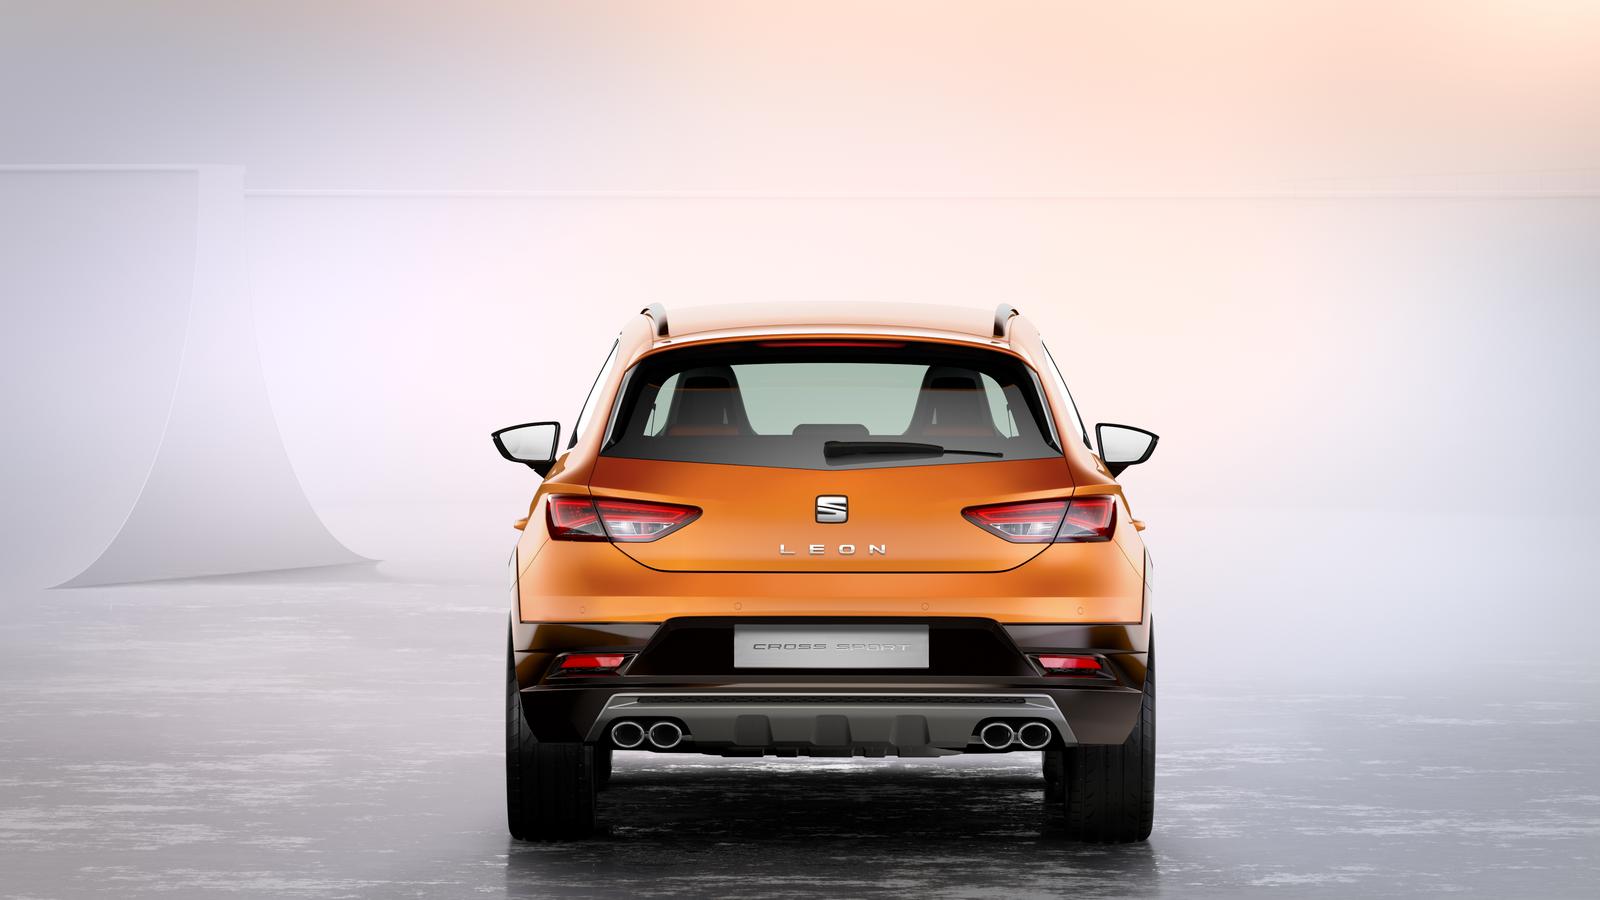 Seat-leon-cross-sport-concept-7